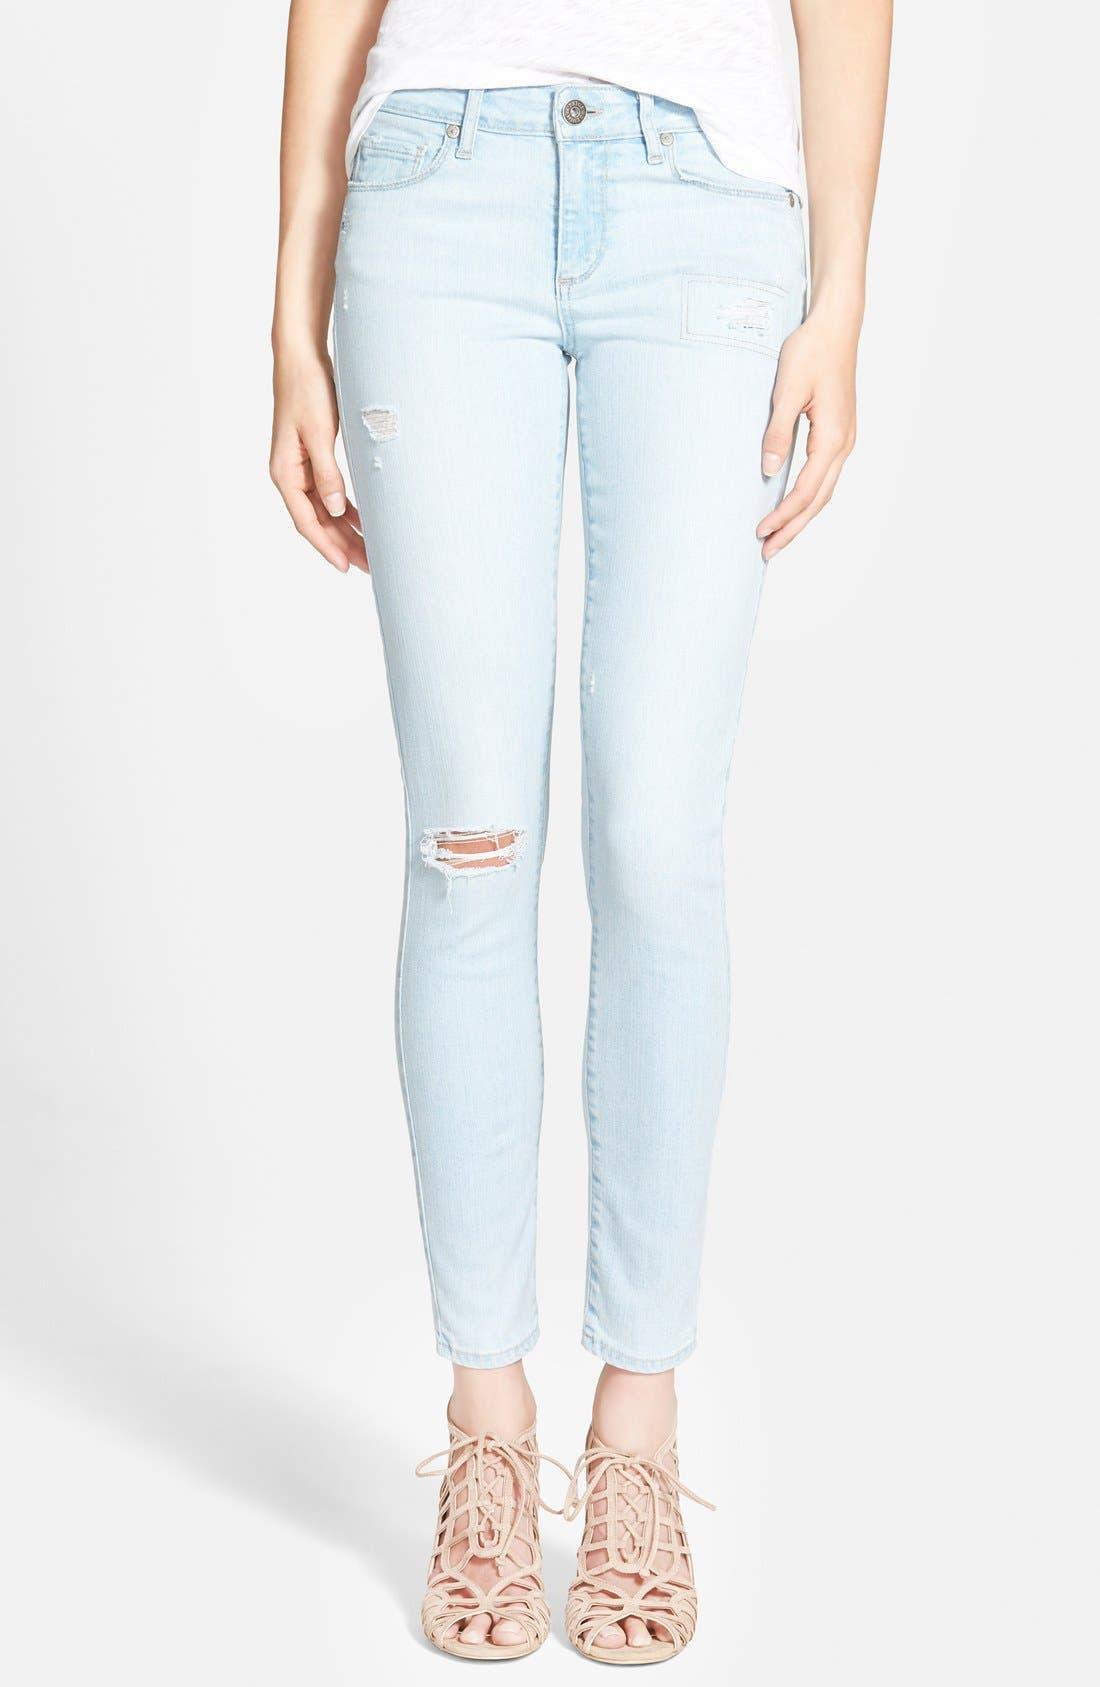 Main Image - Paige Denim 'Verdugo' Ultra Skinny Jeans (Cece  Destructed)